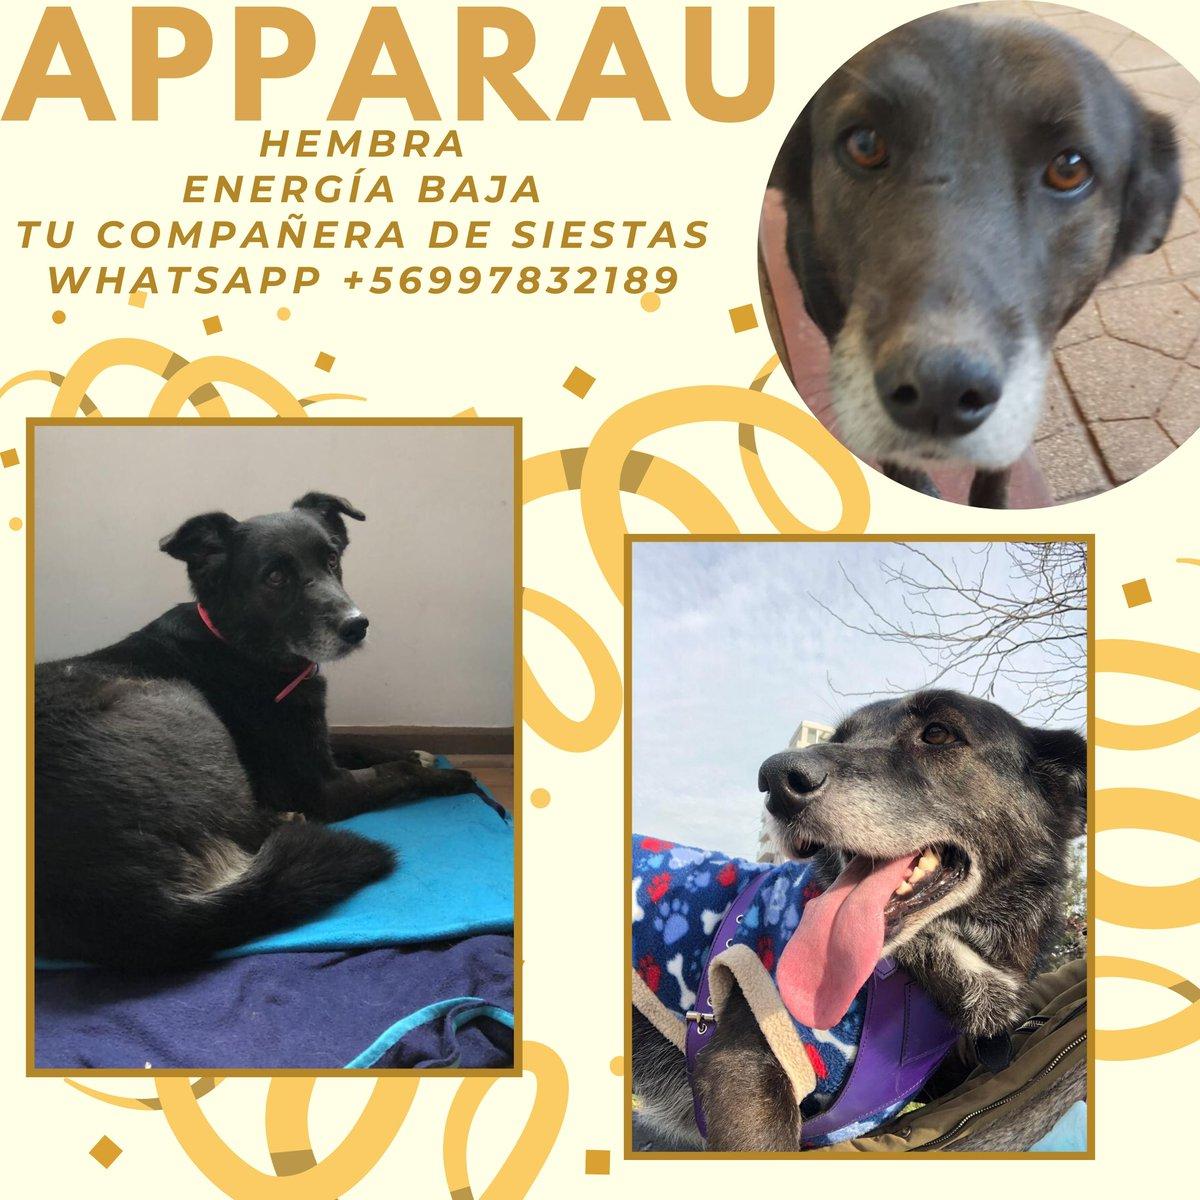 RT por favor. ayudemos a que encuentren un hogar amoroso!! mascotas rescatadas en adopción. STGO. @denissemalebran @carolinapinoc @bartorell @PerrosPlazaHuem @pewos @Kristian_Mella @kattykowaleczko @eltuitdemarsh @KathySalosny @KarendTV @KARENBEJARANOTV https://t.co/cZ0oS3jJQb